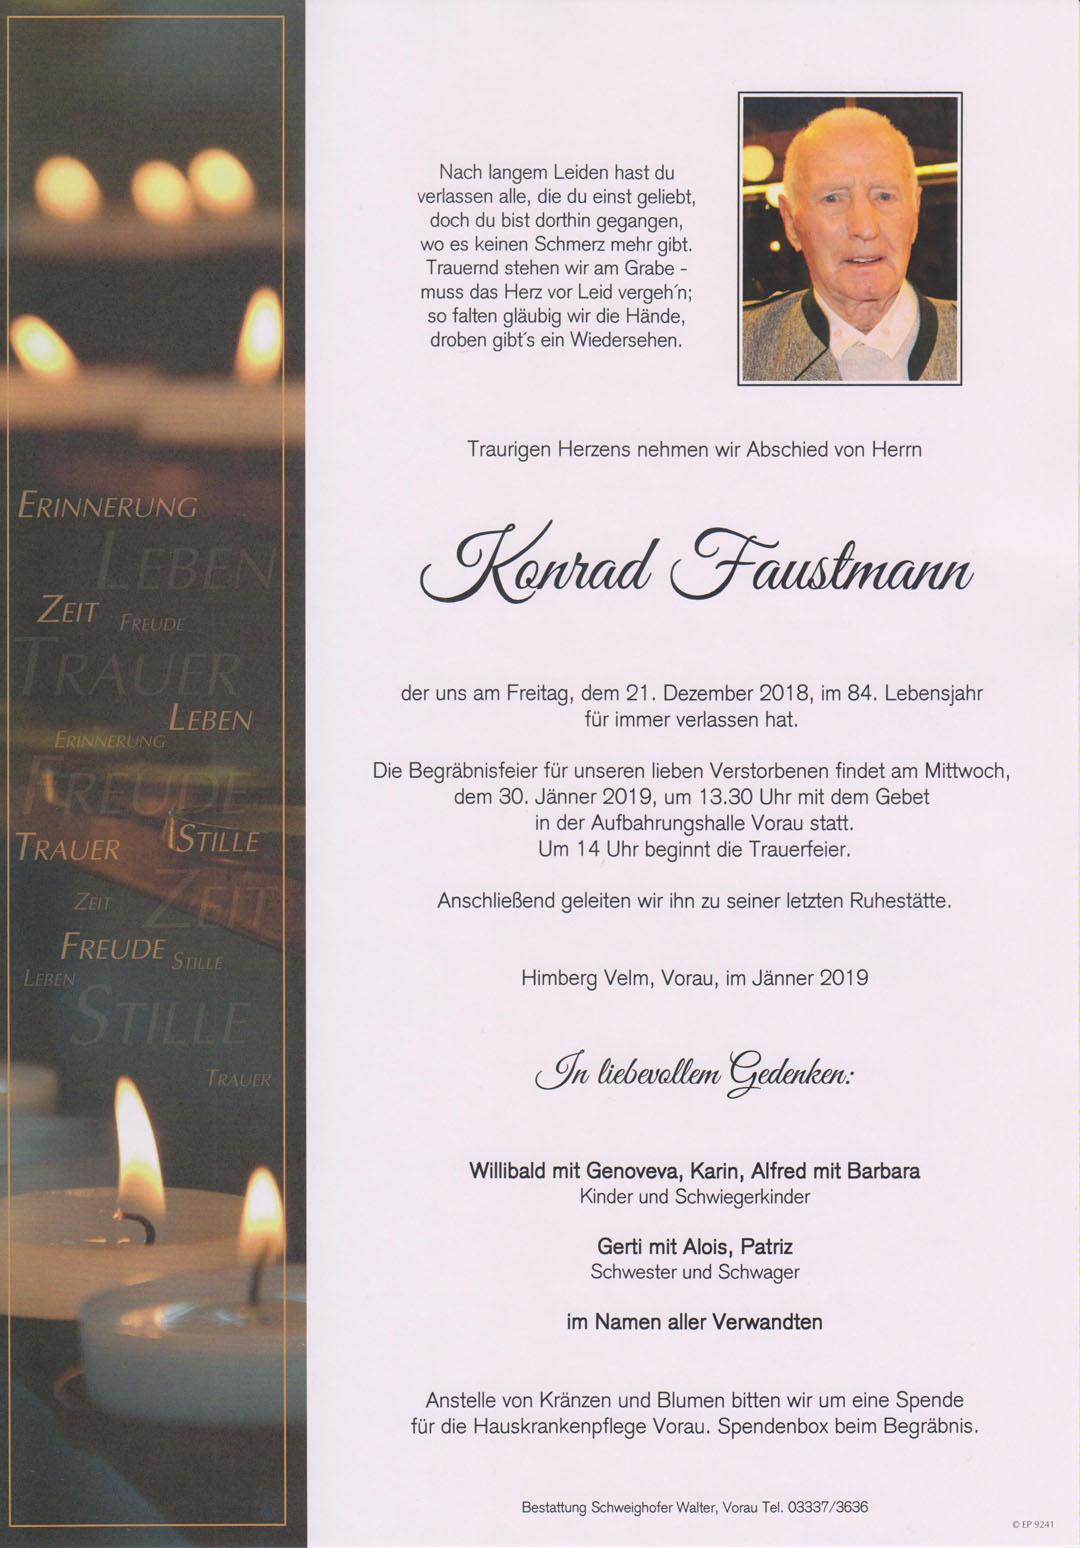 Konrad Faustmann